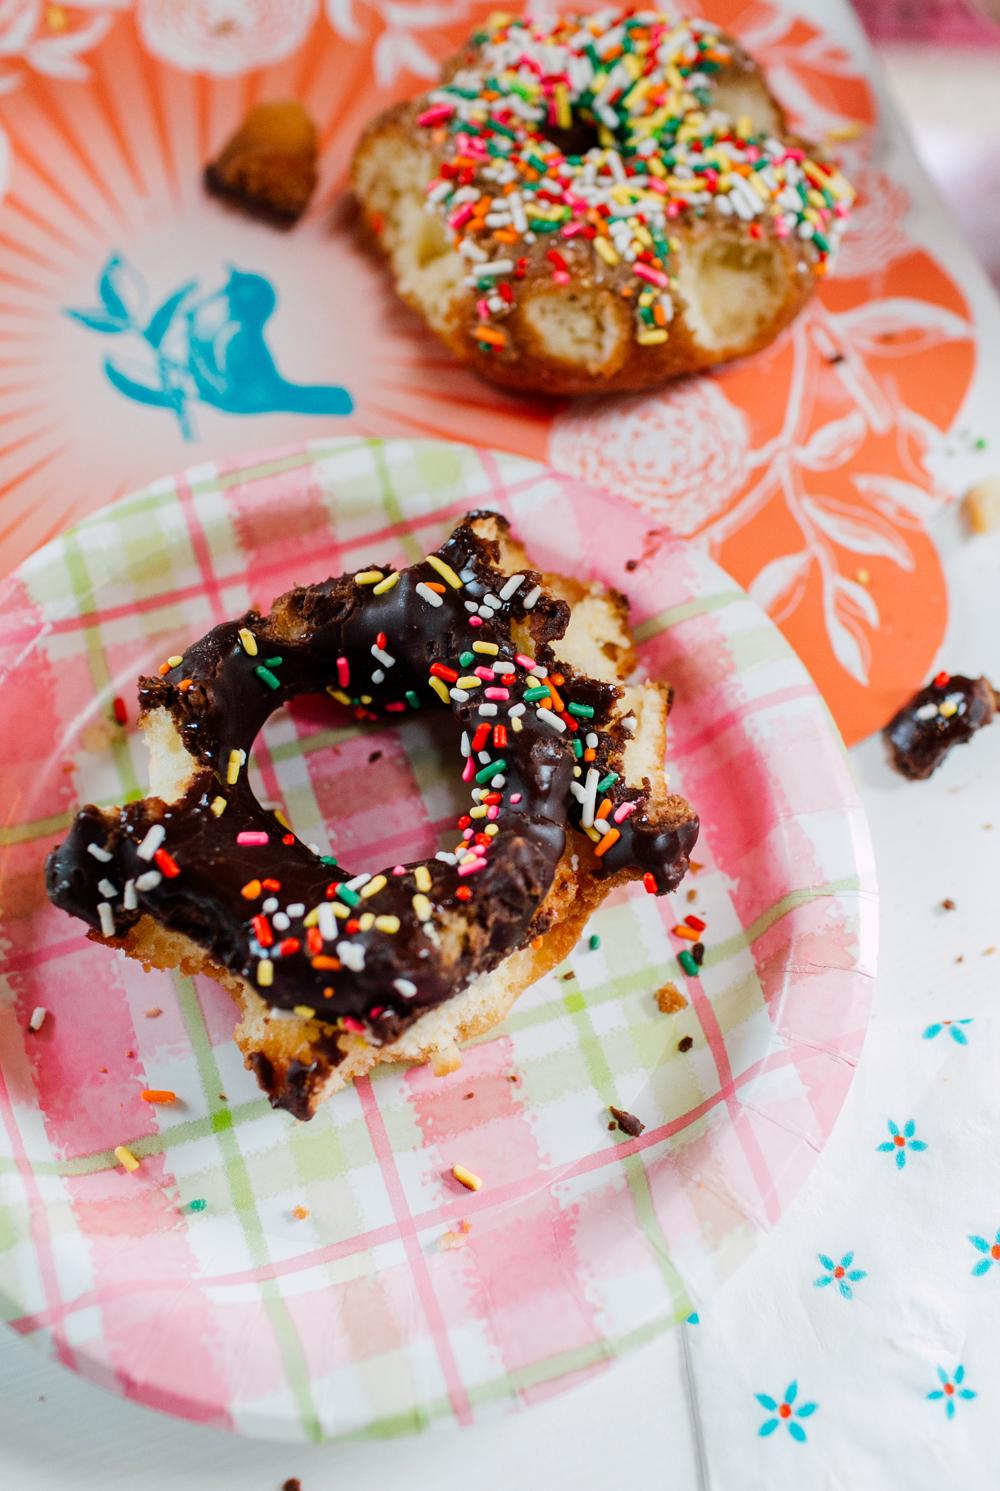 026-bellingham-family-lifestyle-photographer-katheryn-moran-donut-shop-ludke.jpg